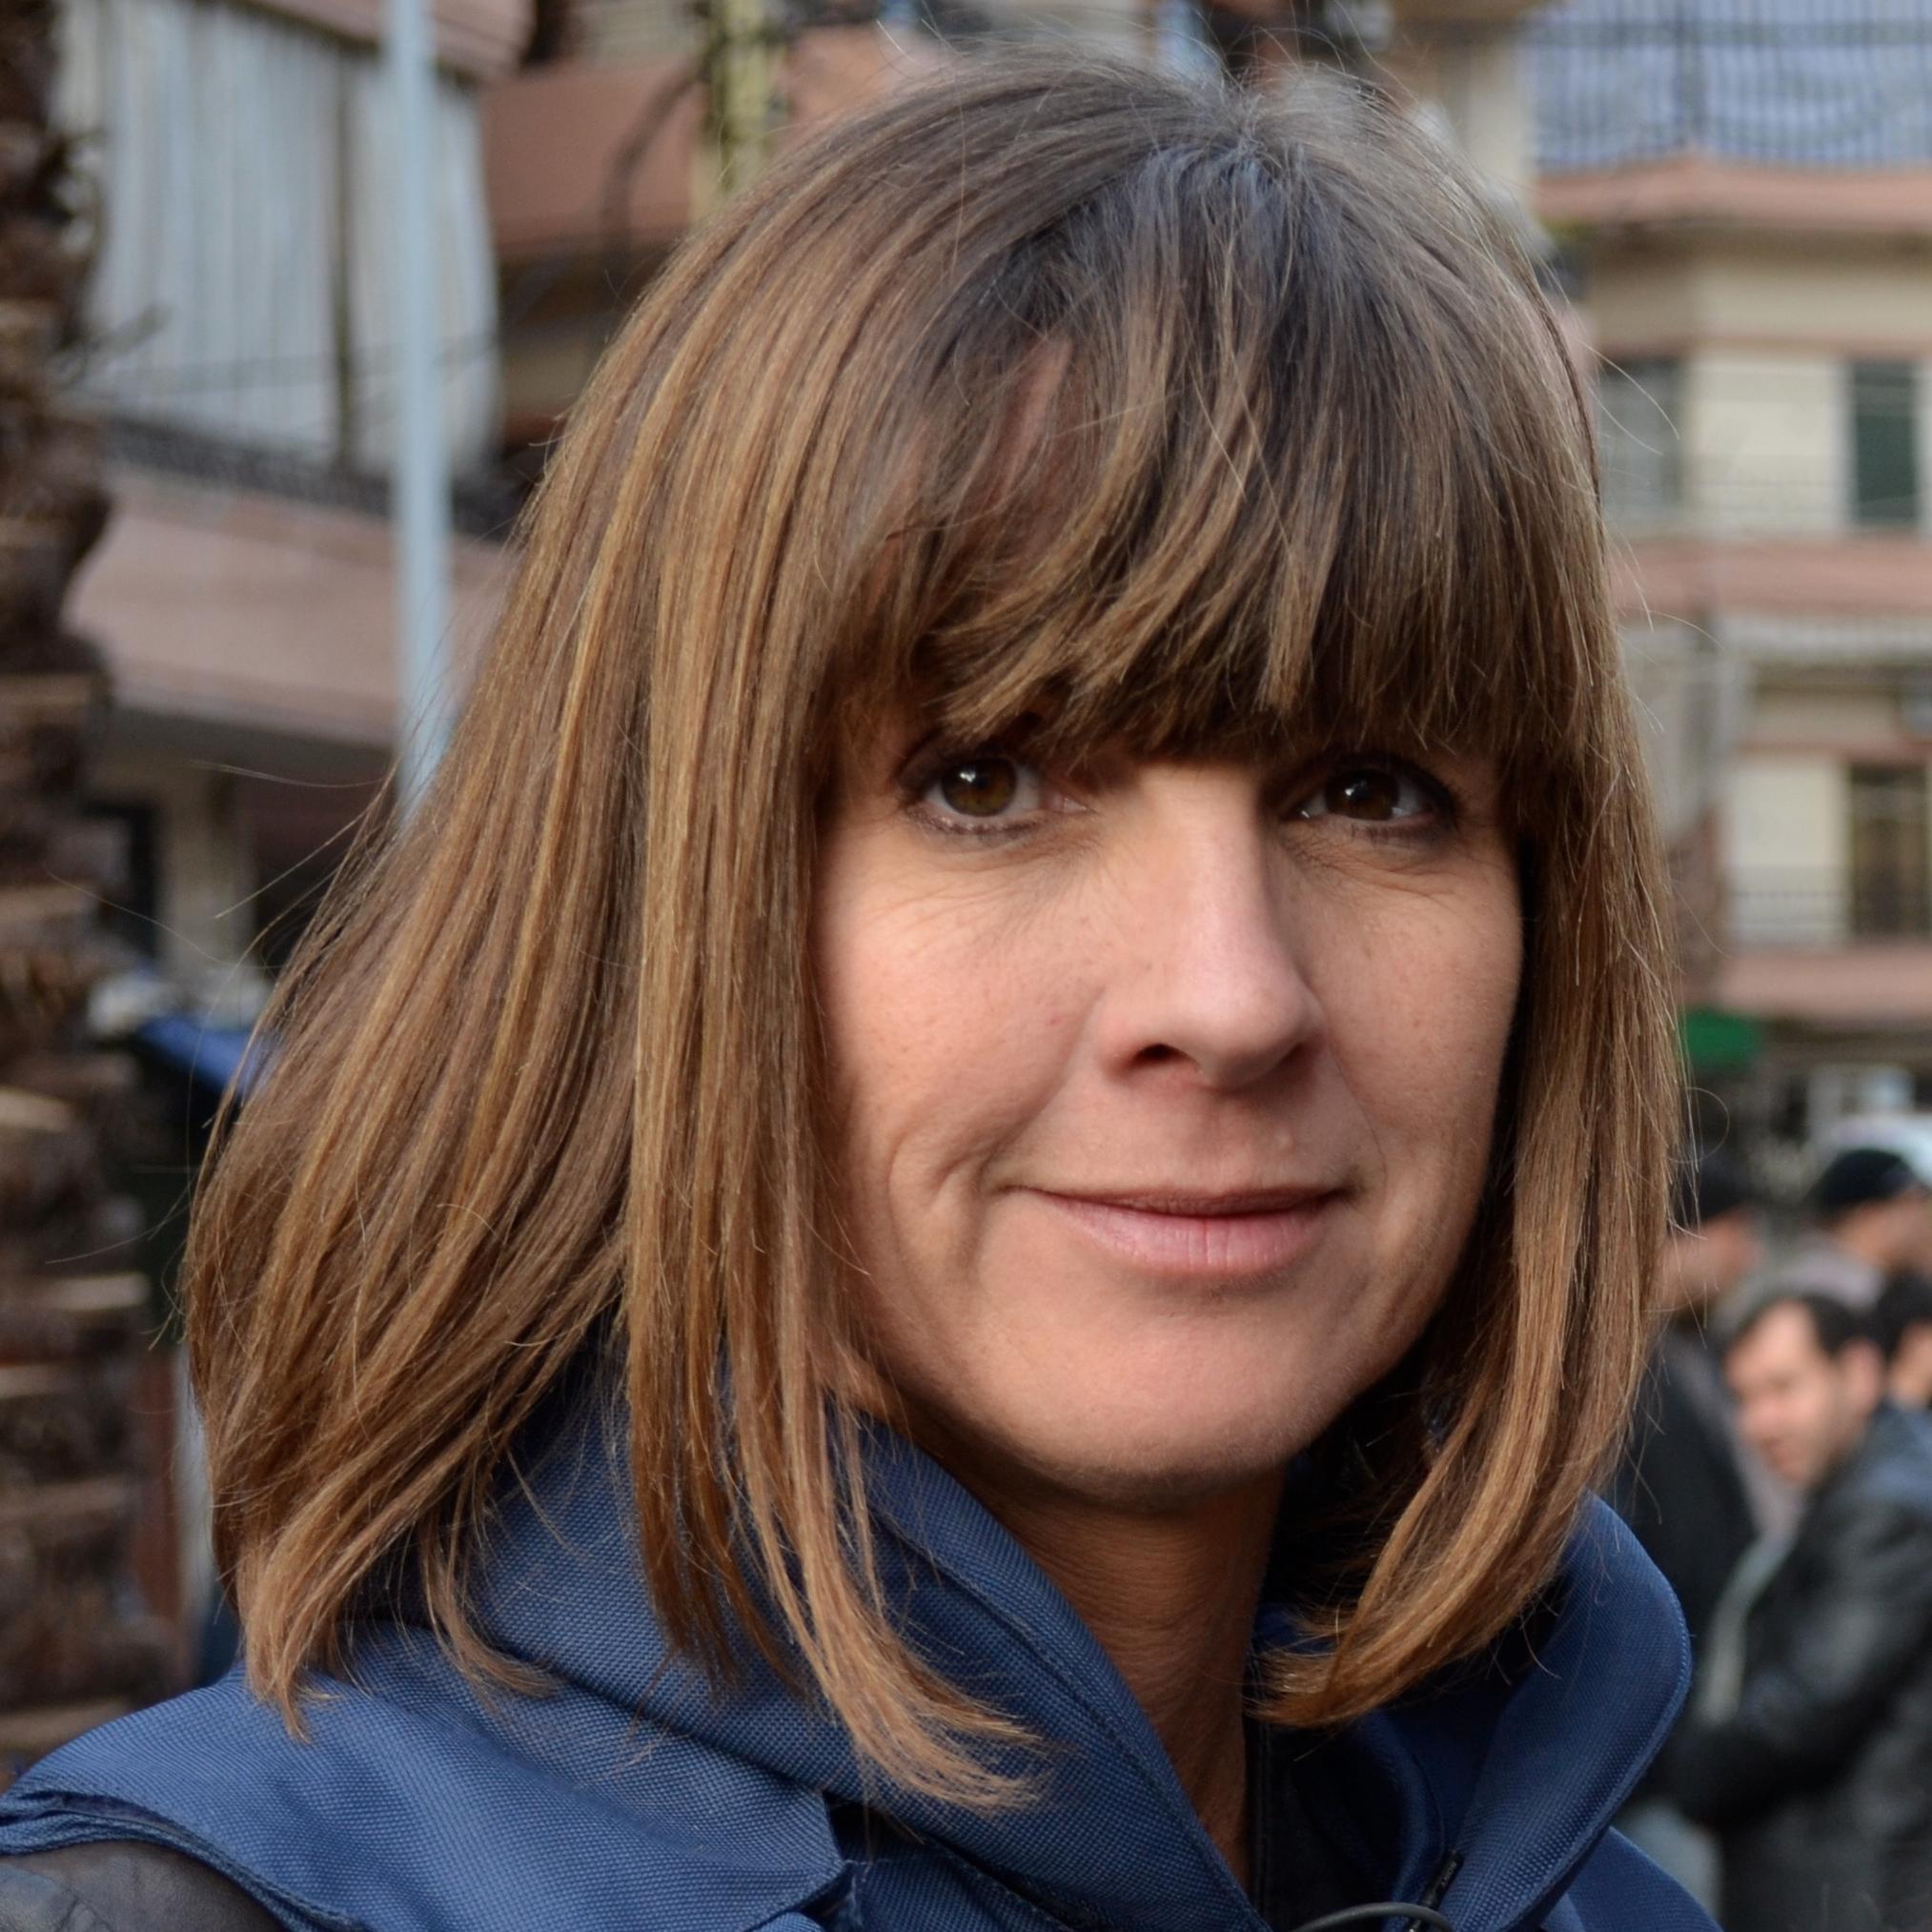 Mary Wynn Erotic clips Heidi Valkenburg,Ania Pieroni